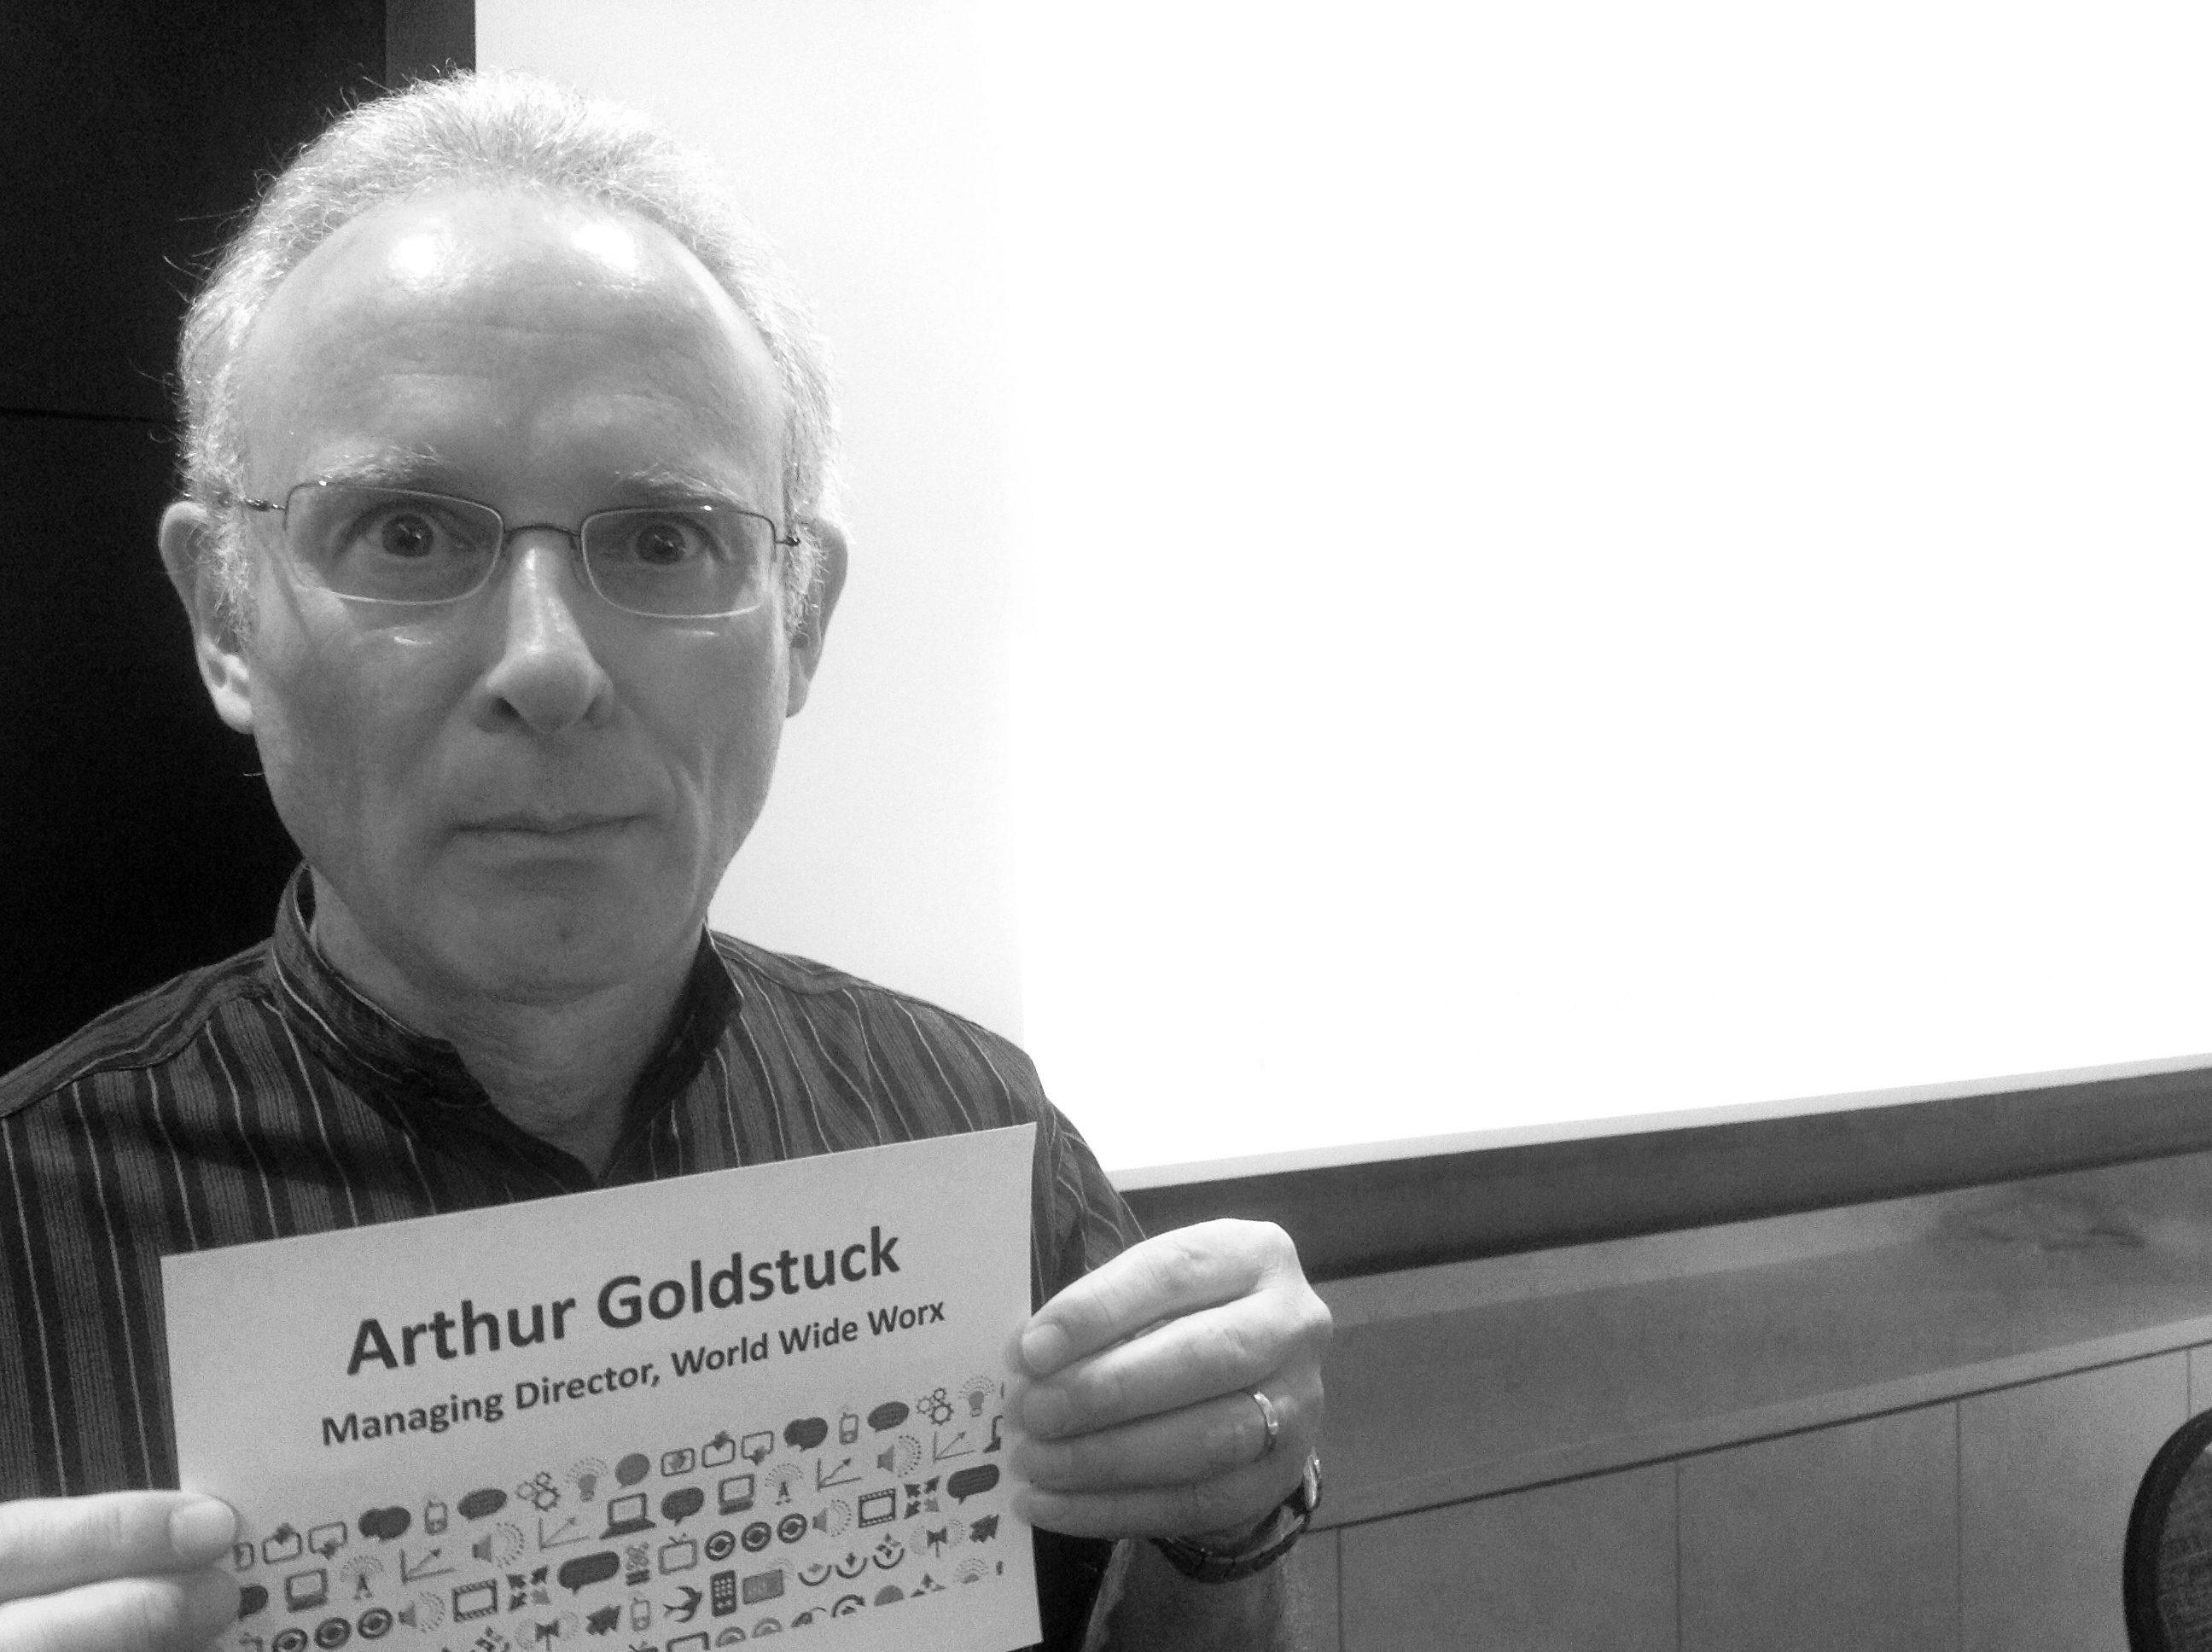 Arthur-Goldstuck-mugg-shot-taken-at-Digibate.jpg